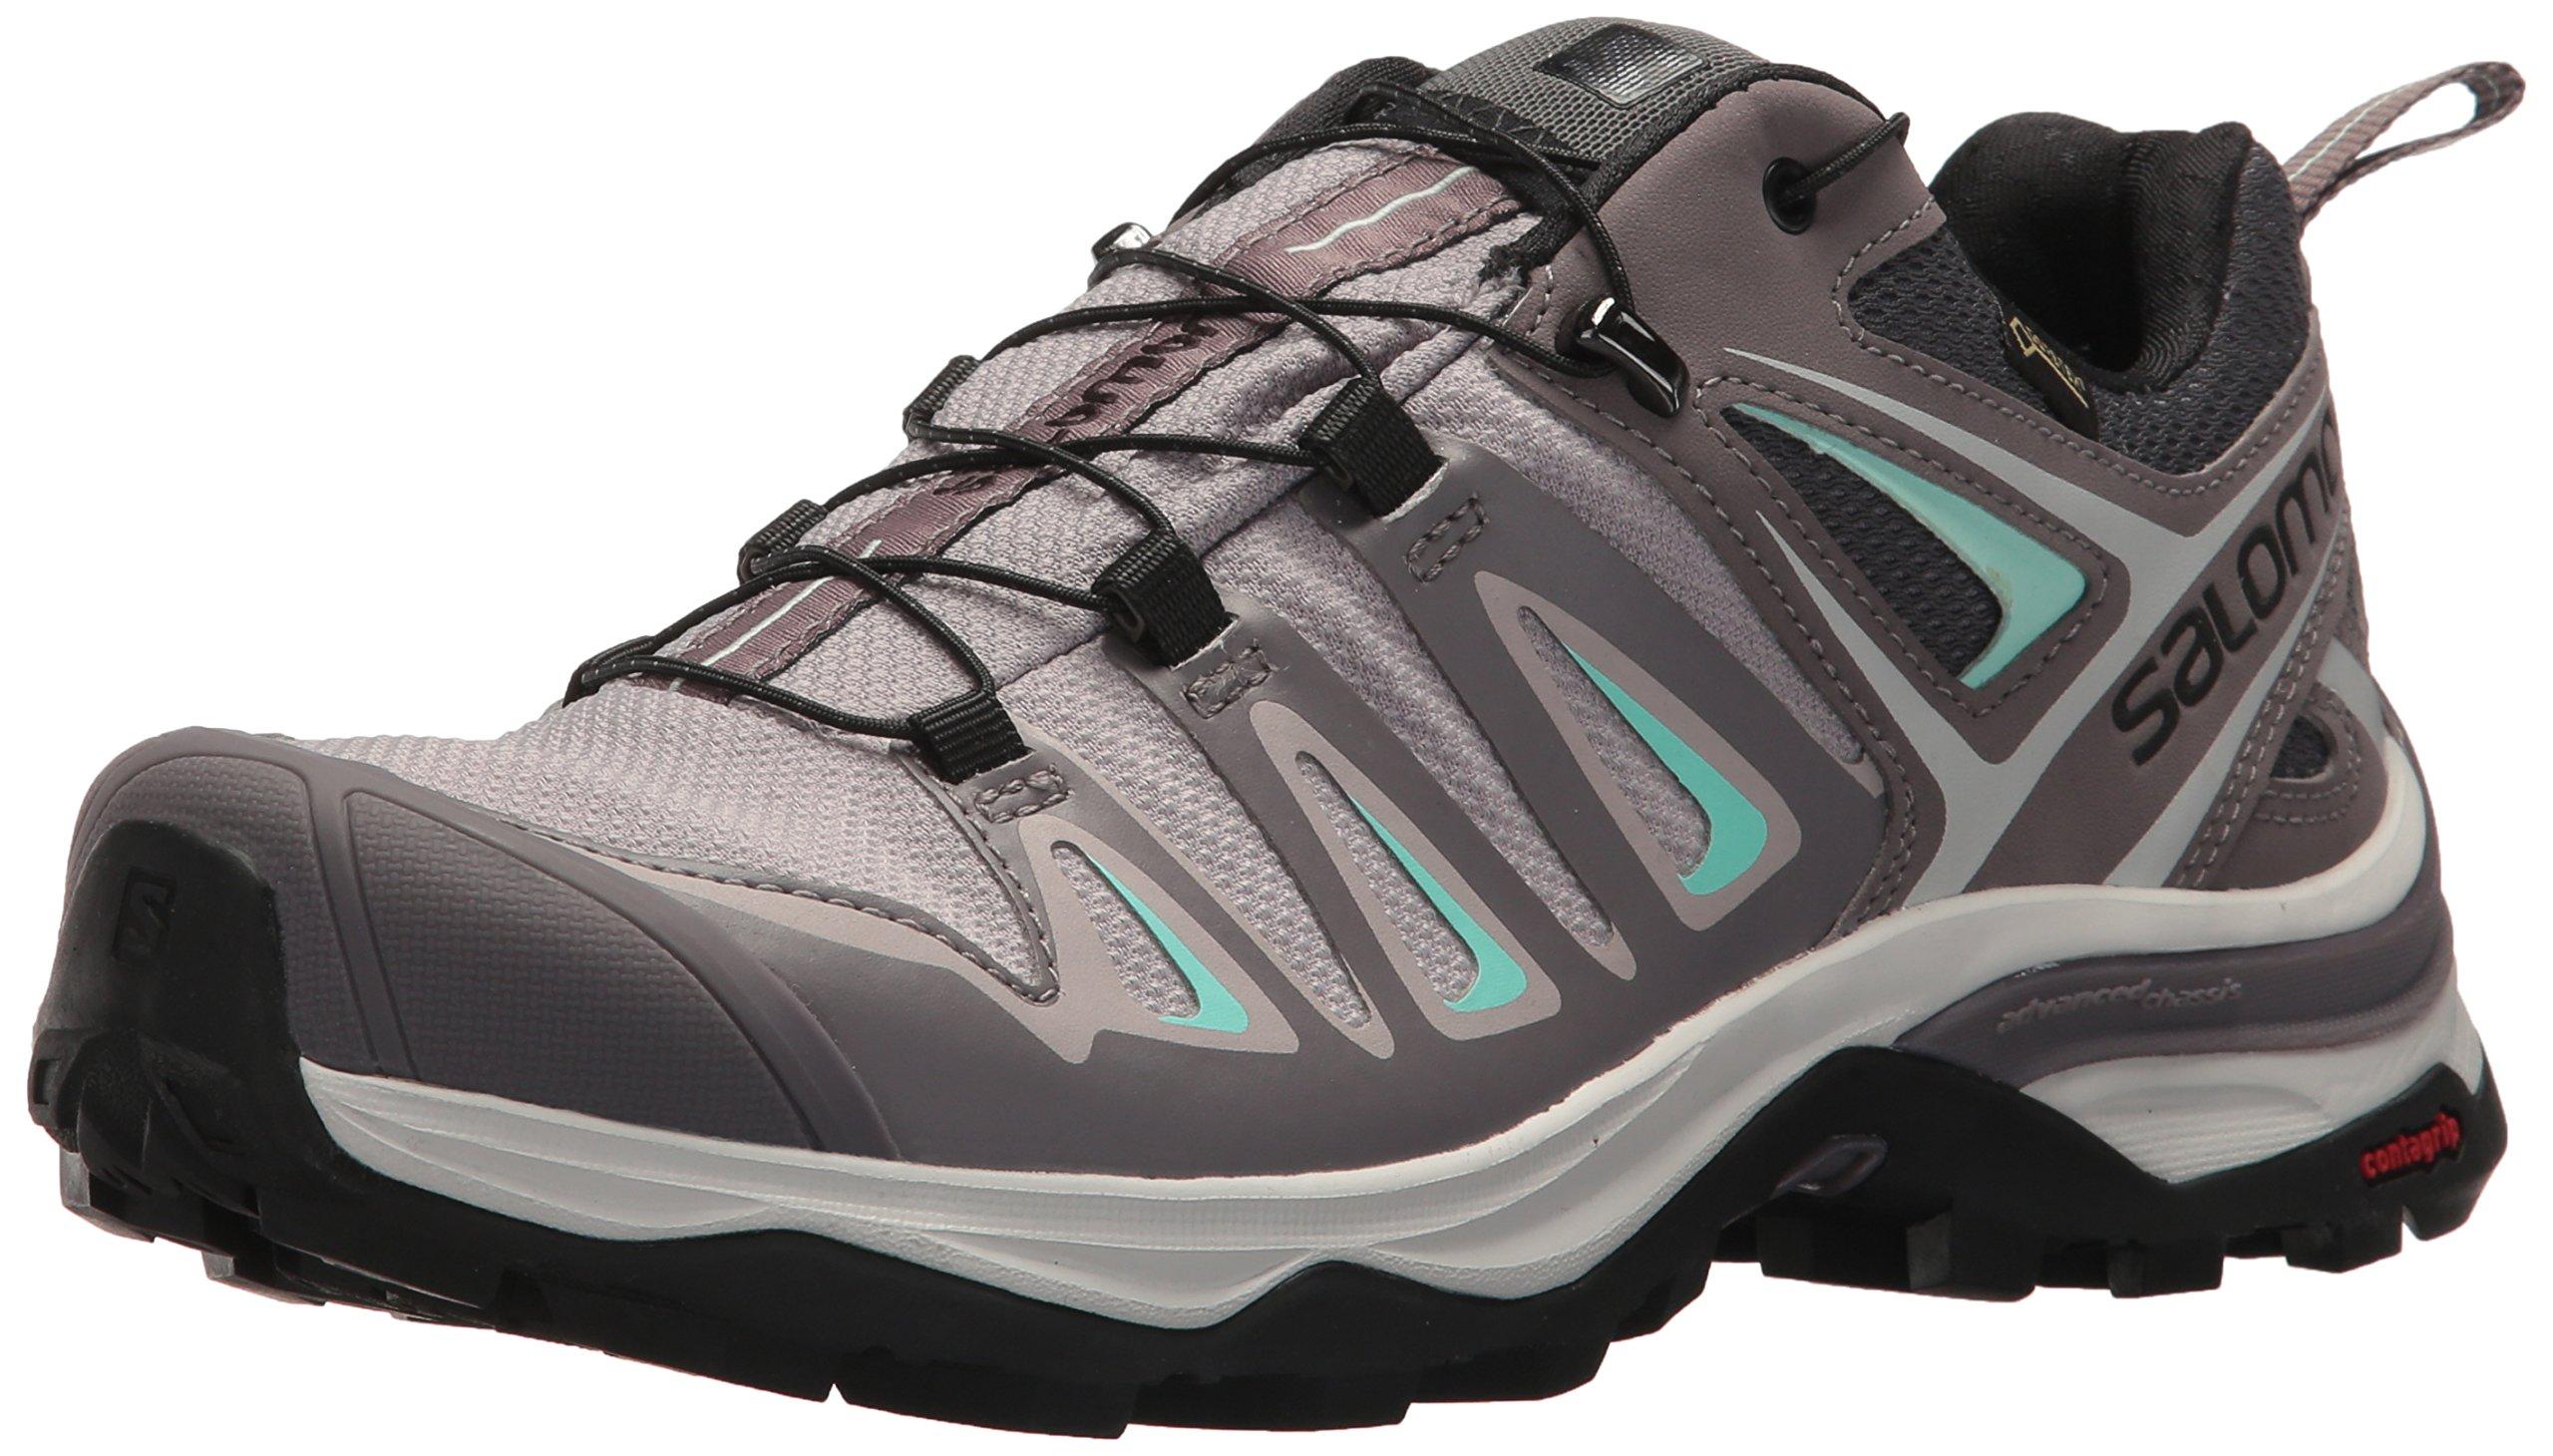 Salomon Women's X Ultra 3 GTX Trail Running Shoe, Magnet, 5 M US